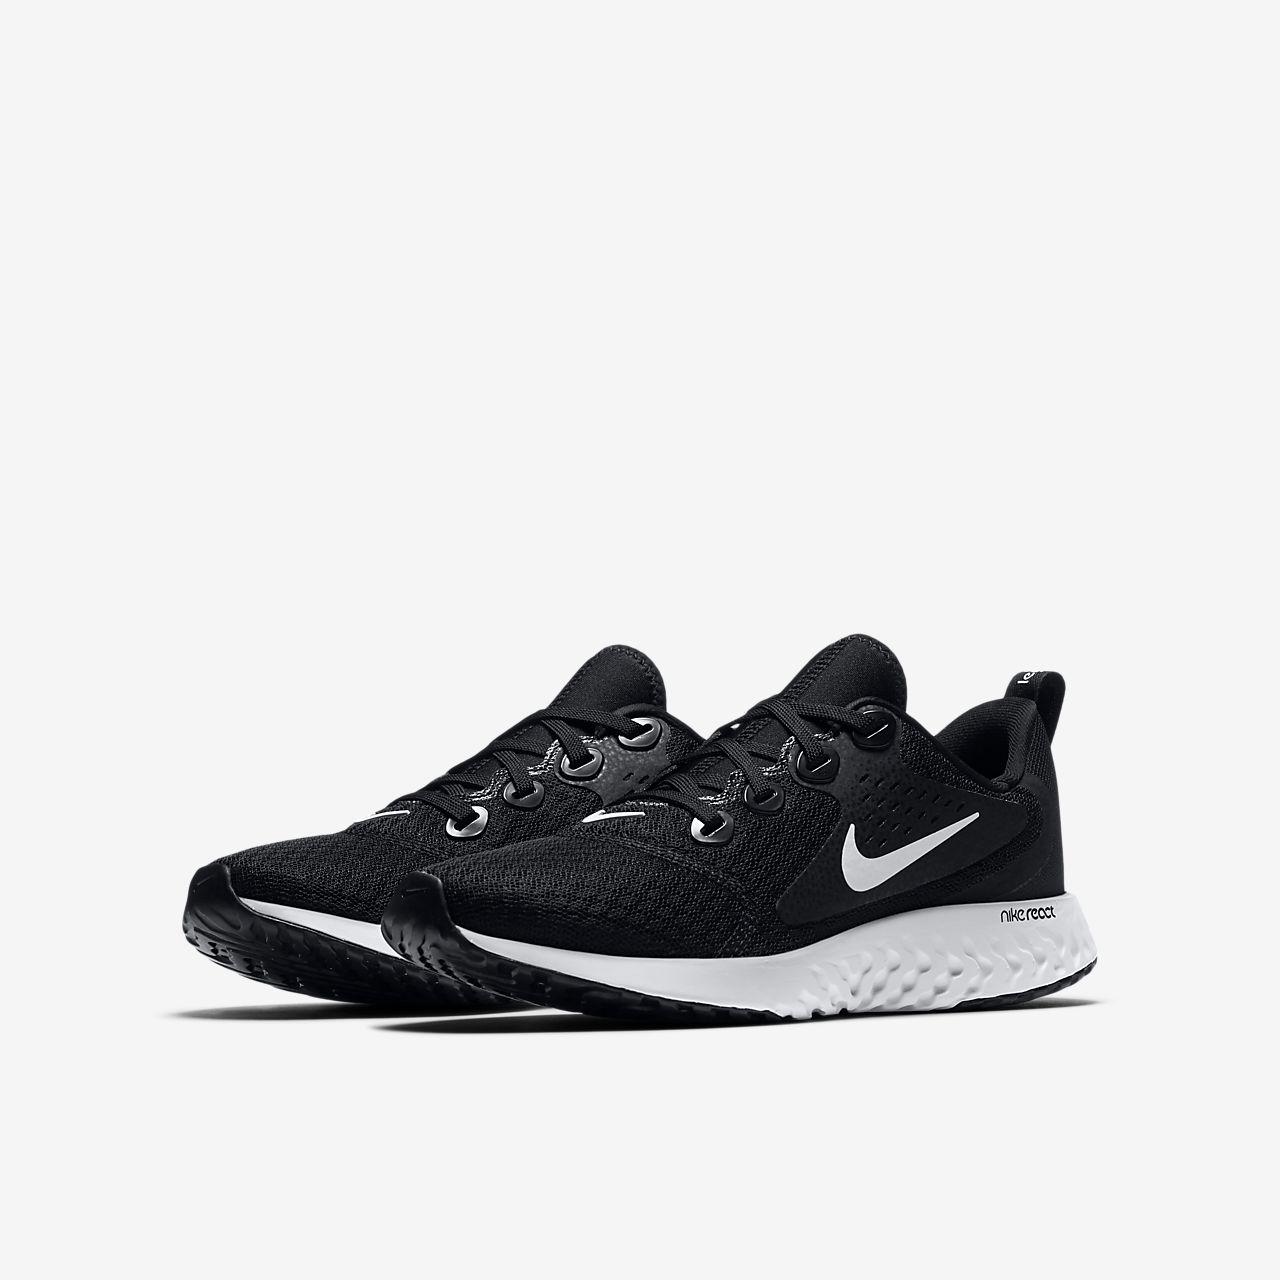 brand new 6ca1e 44ac7 ... Nike Legend React Older Kids  Running Shoe